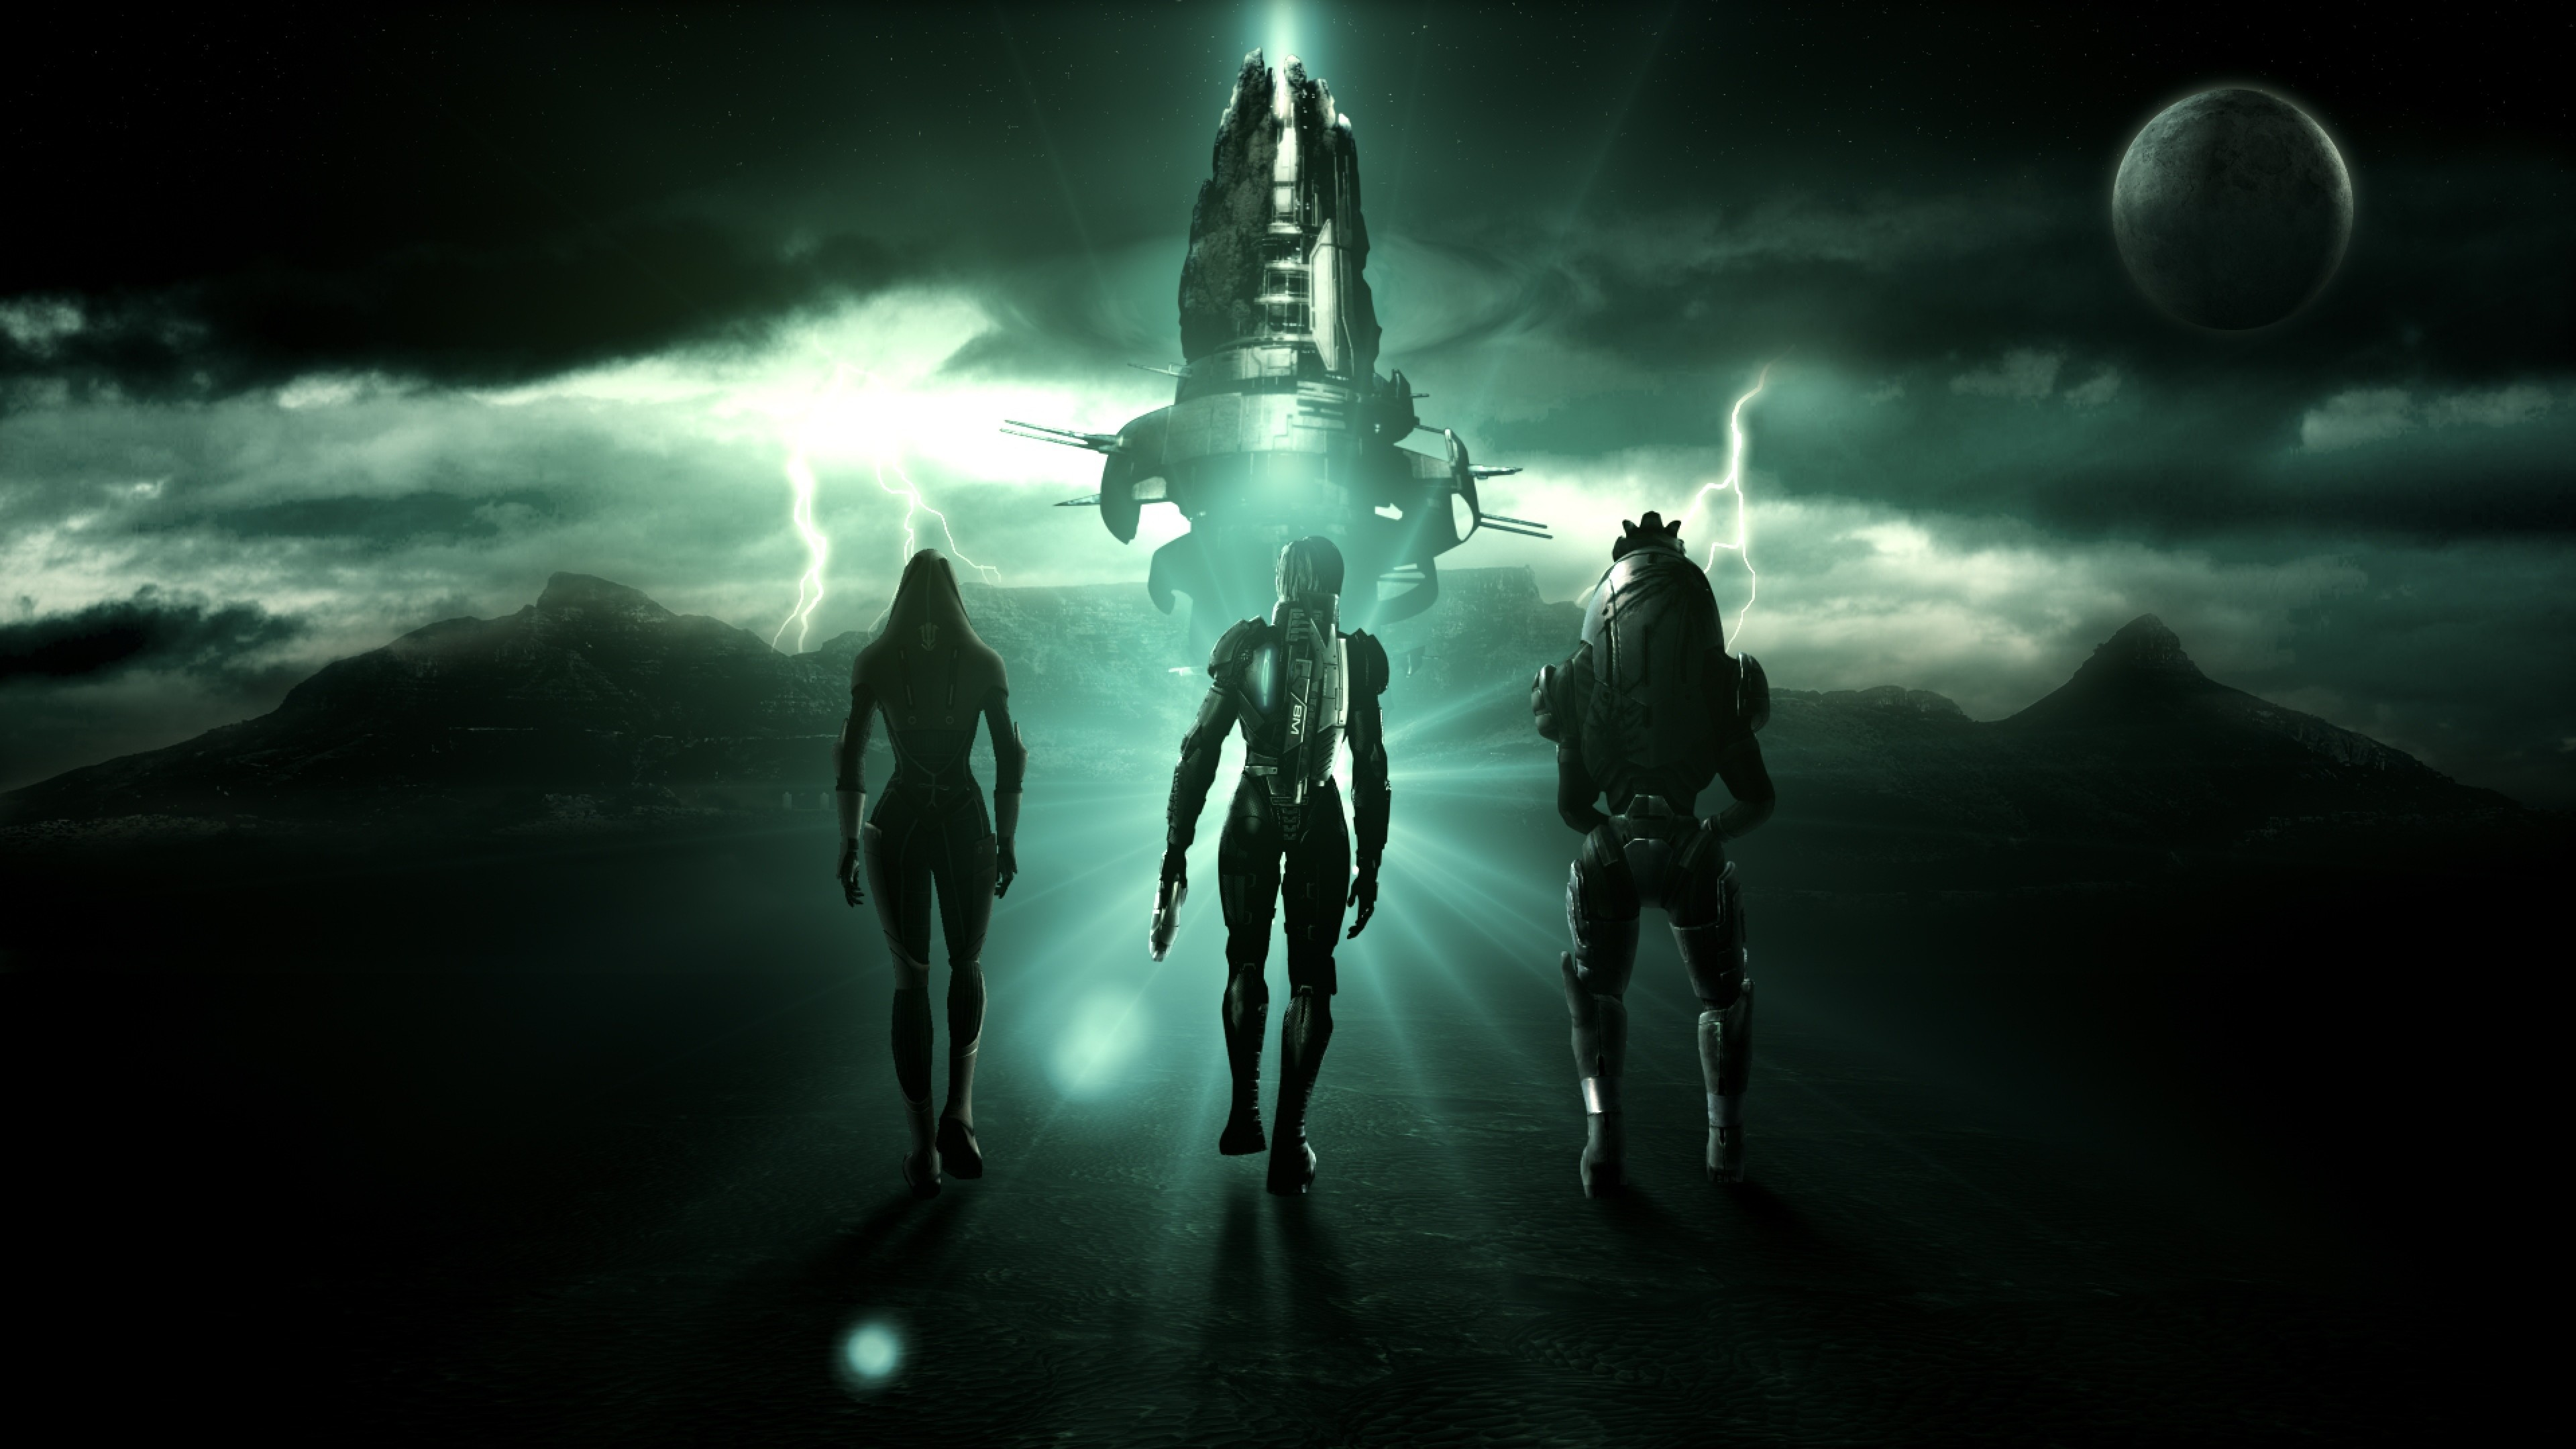 Mass-effect-tali-zorah-characters-spaceship-sky-clouds-